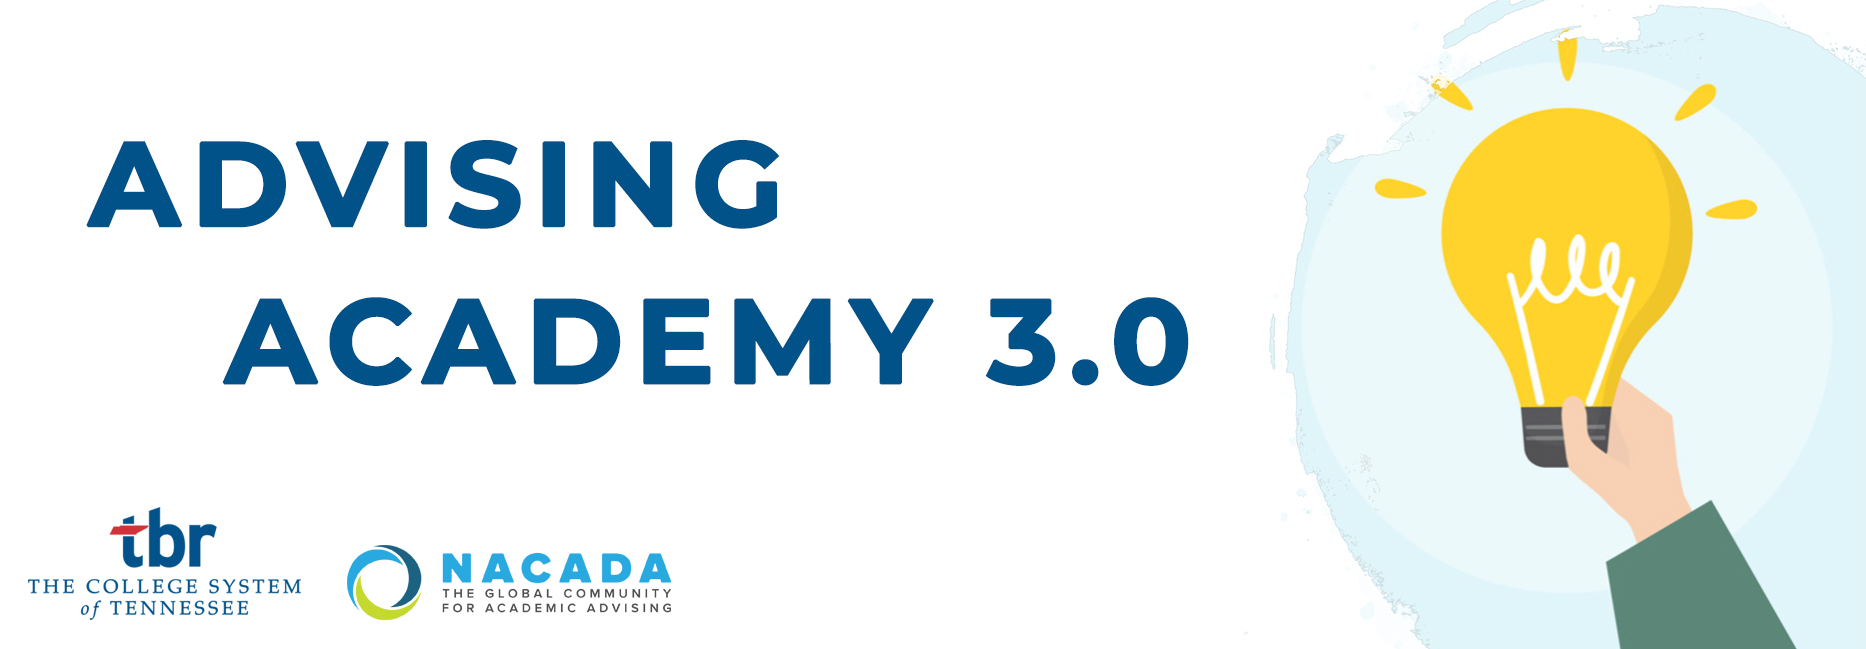 Advising Academy 3.0